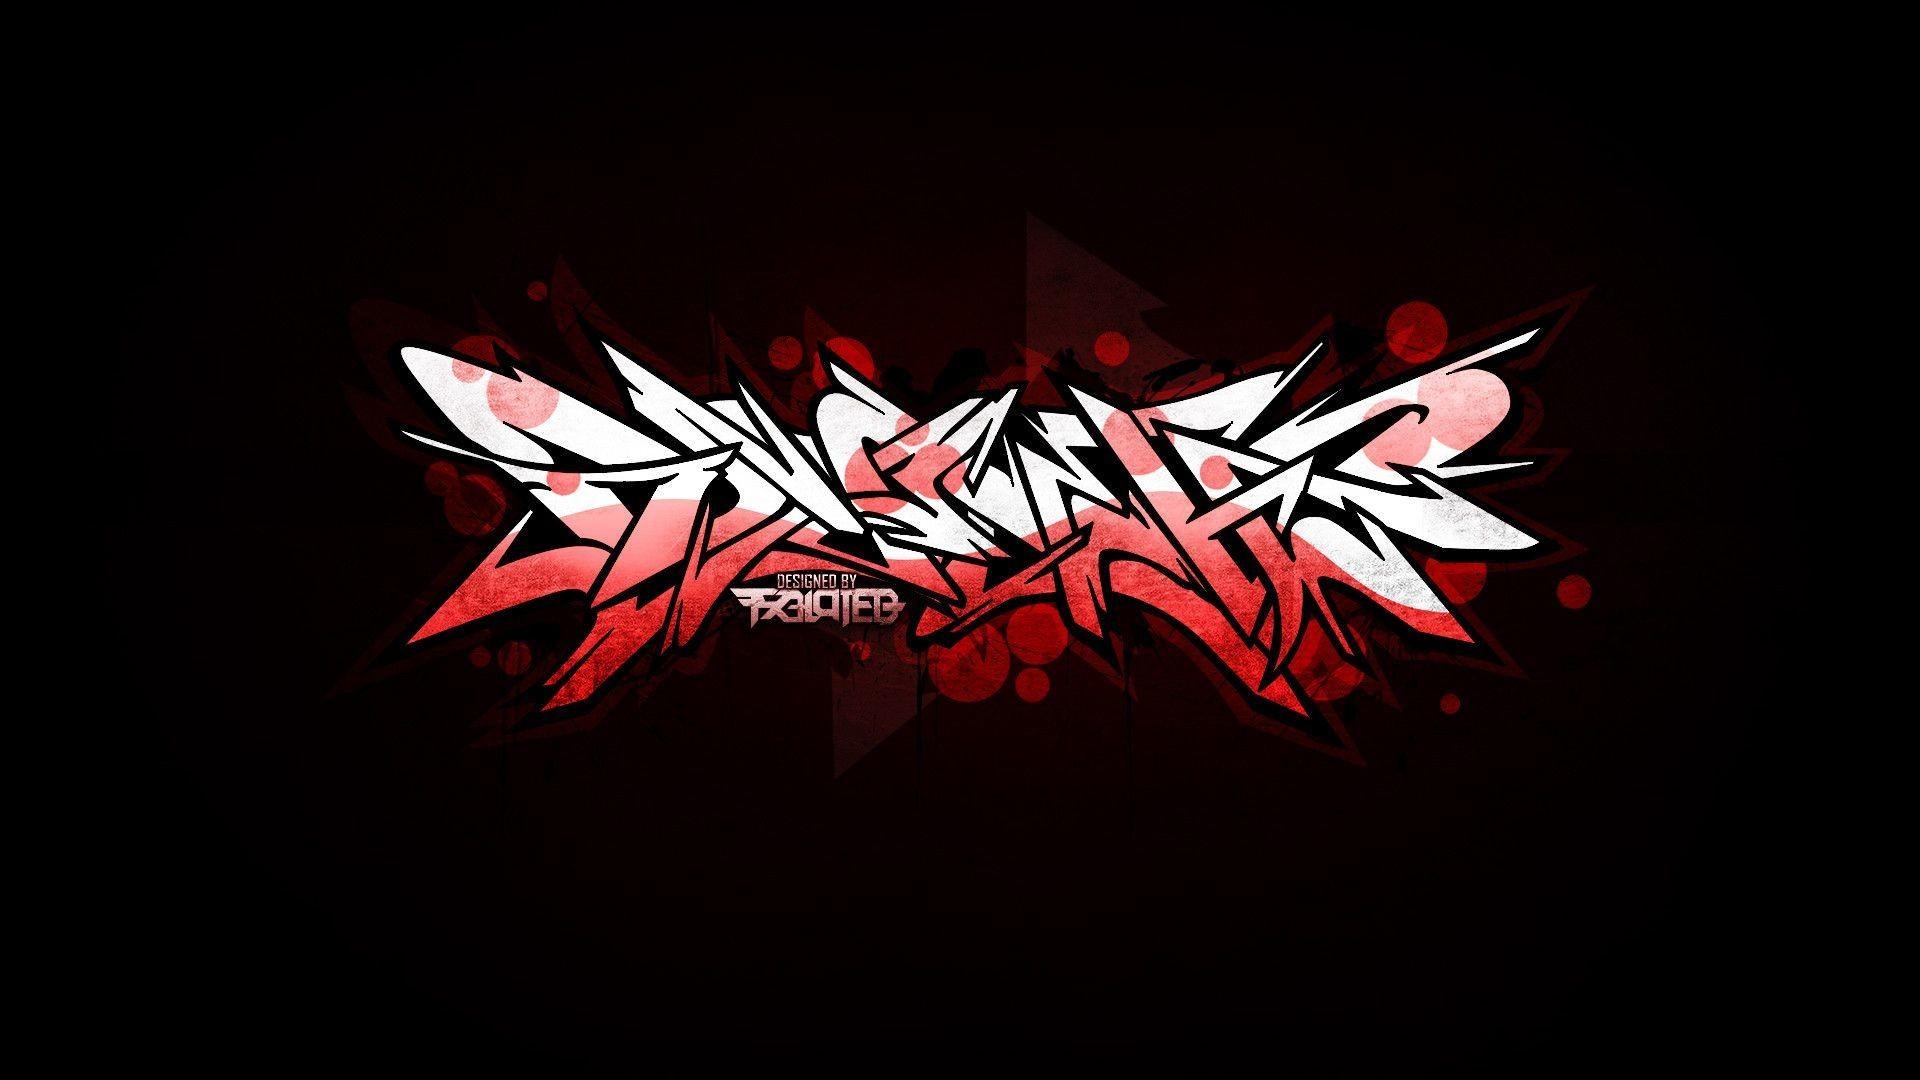 Abstract Graffiti Wallpaper, High Quality Pics of Abstract .